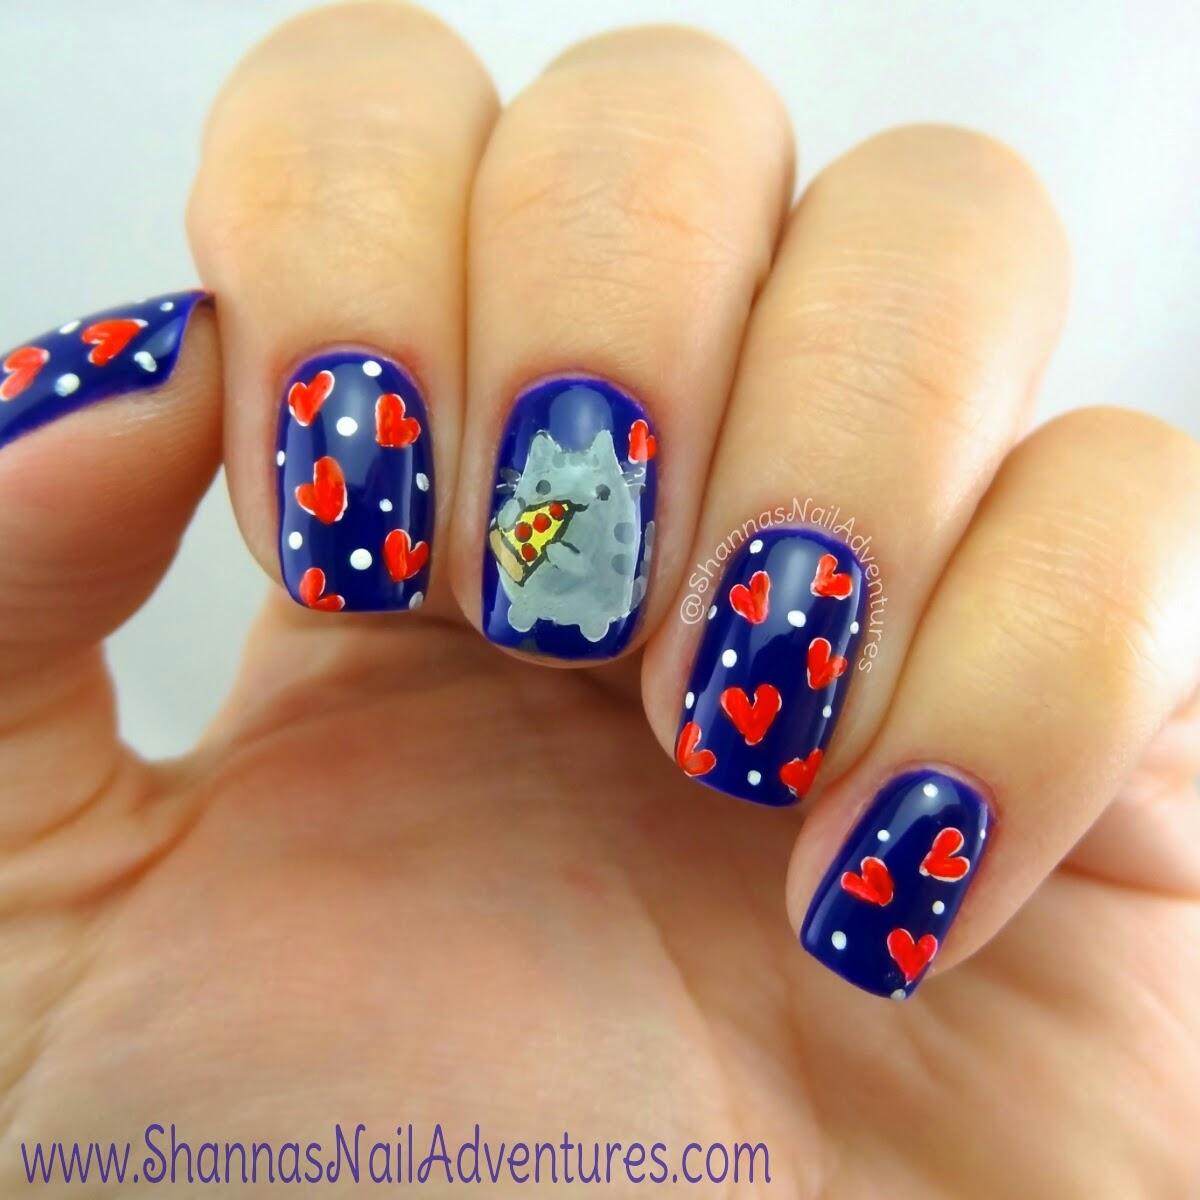 Shanna\'s Nail Adventures: September Nail Art Challenge